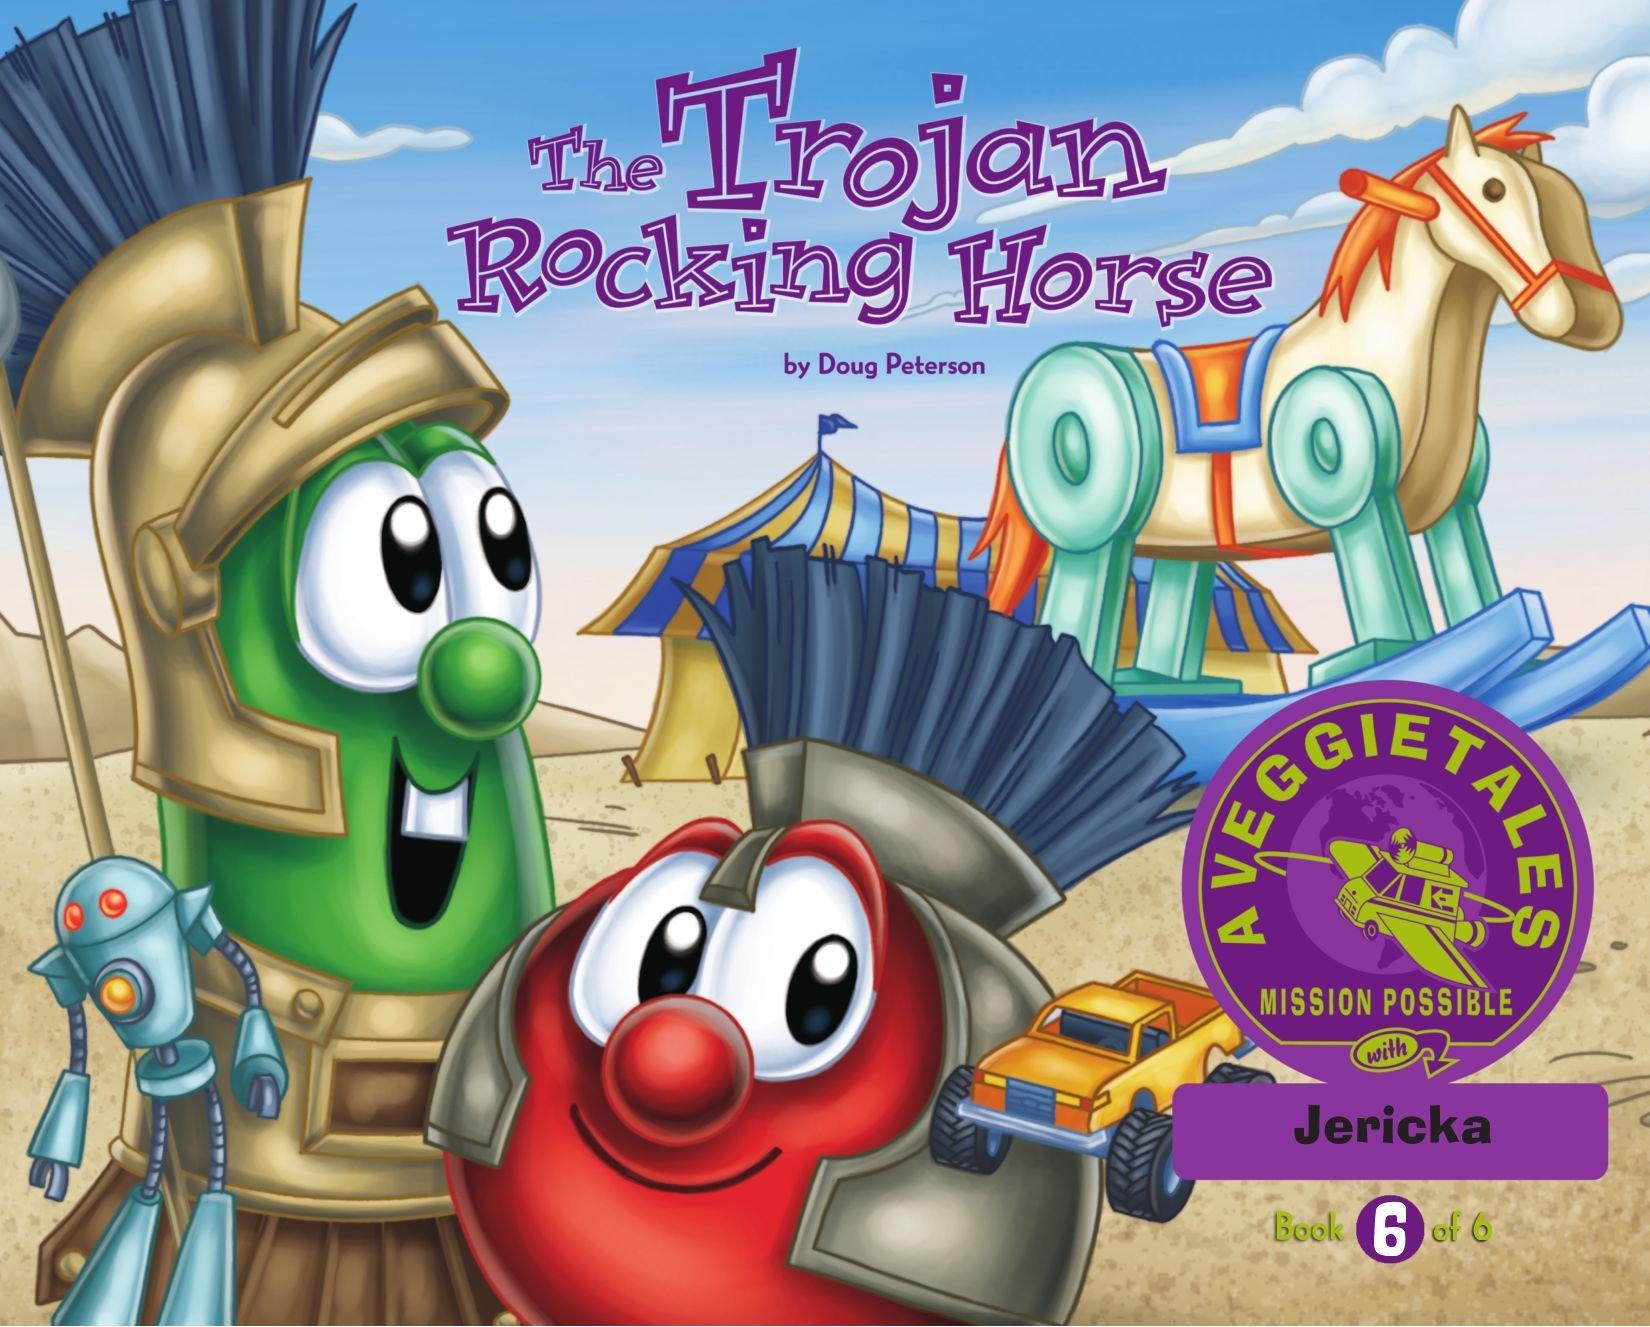 The Trojan Rocking Horse - VeggieTales Mission Possible Adventure Series #6: Personalized for Jericka (Girl) pdf epub